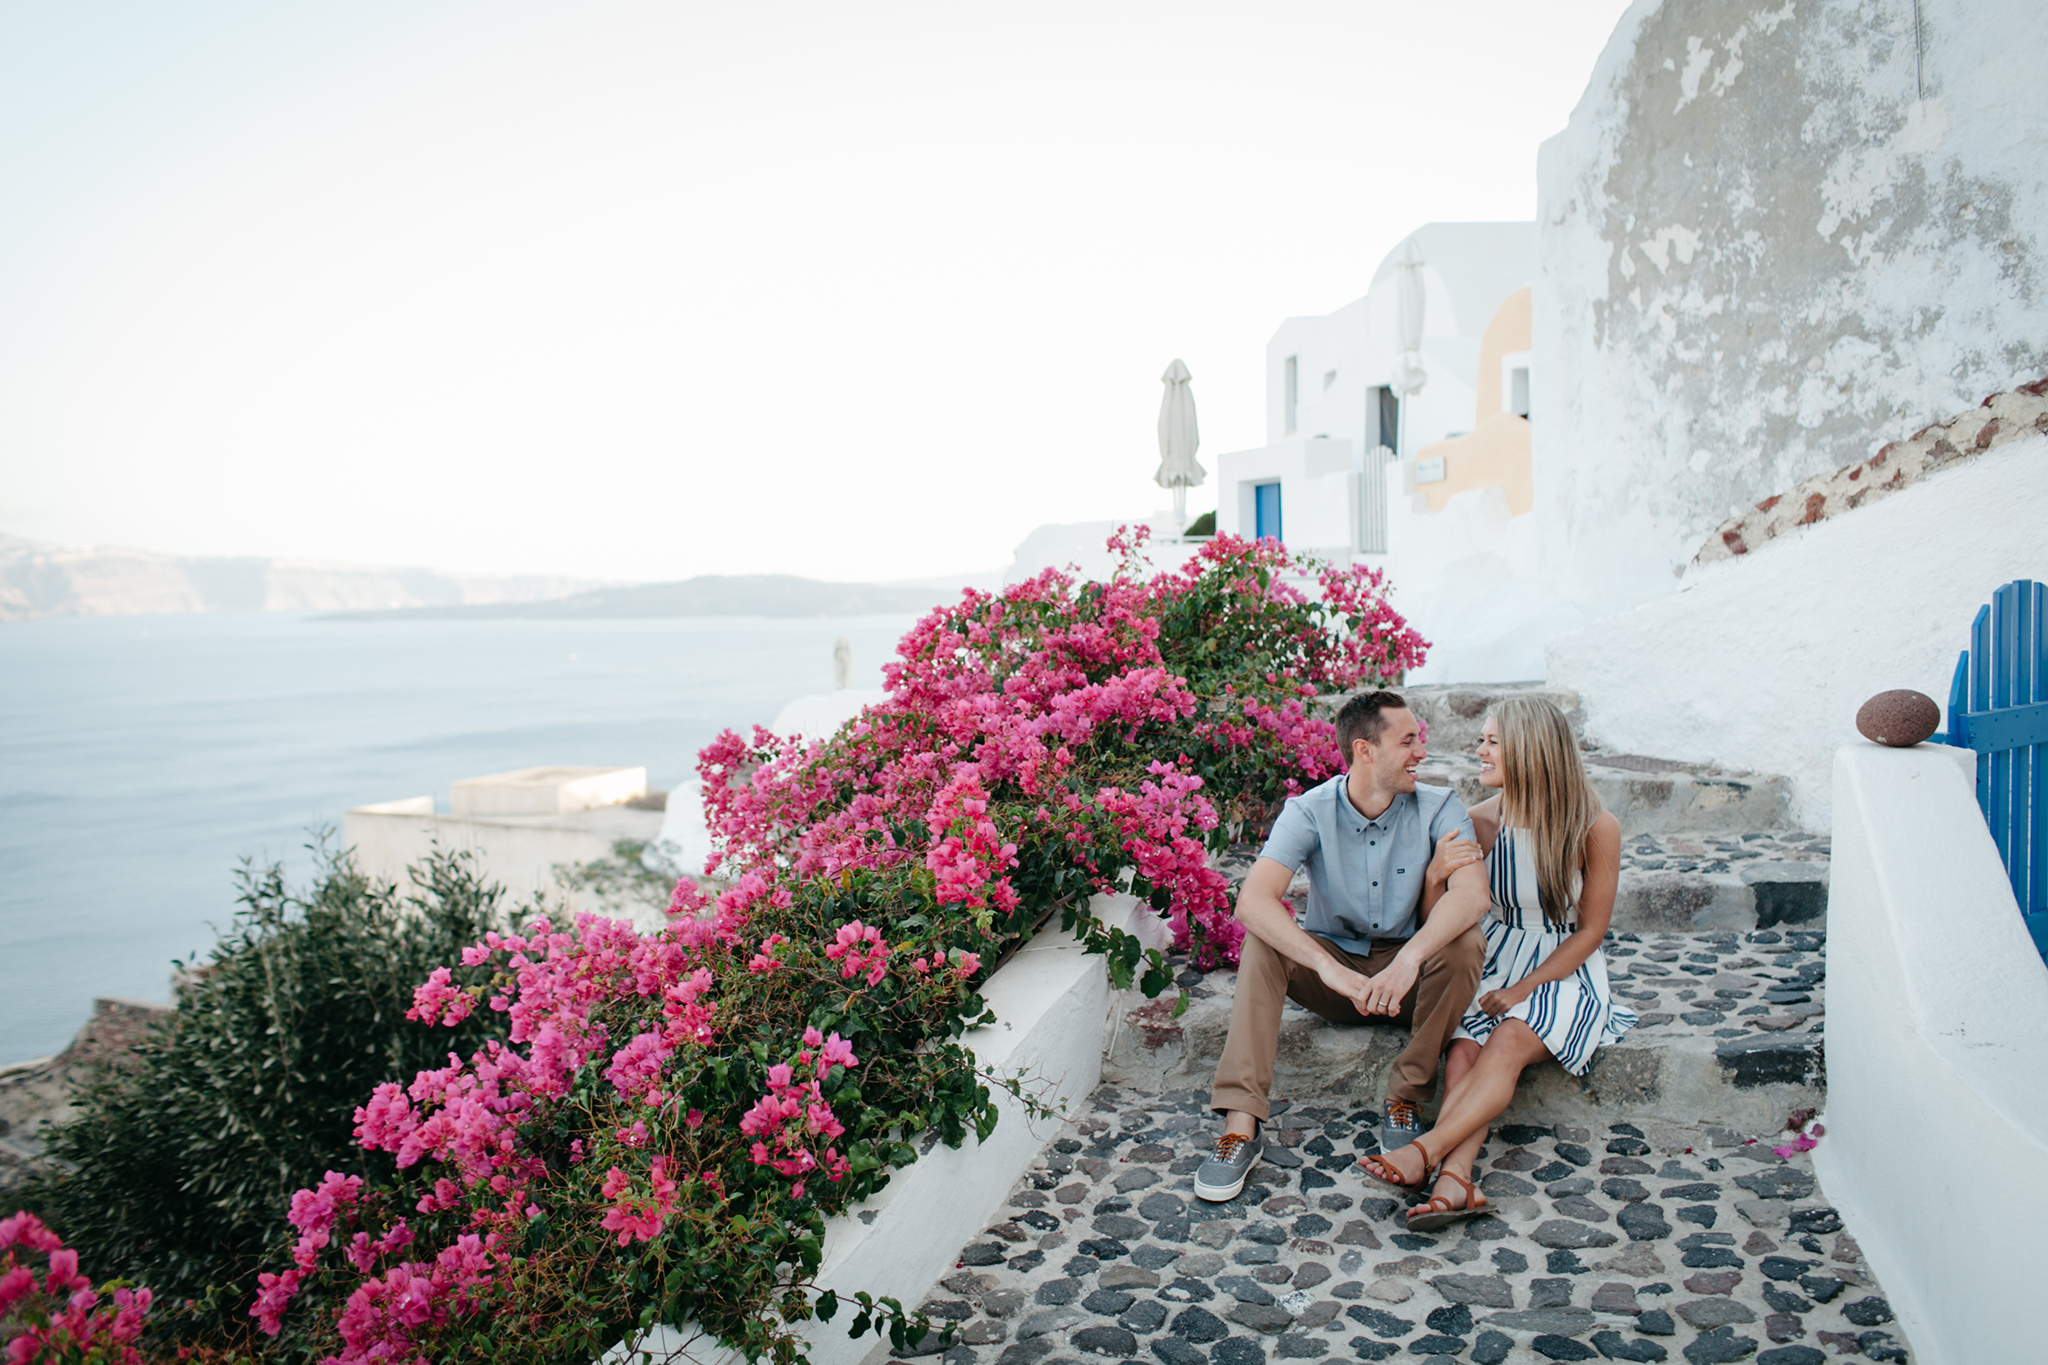 santorini_greece_engagement_katepricephotography_jaclynandchristian_001